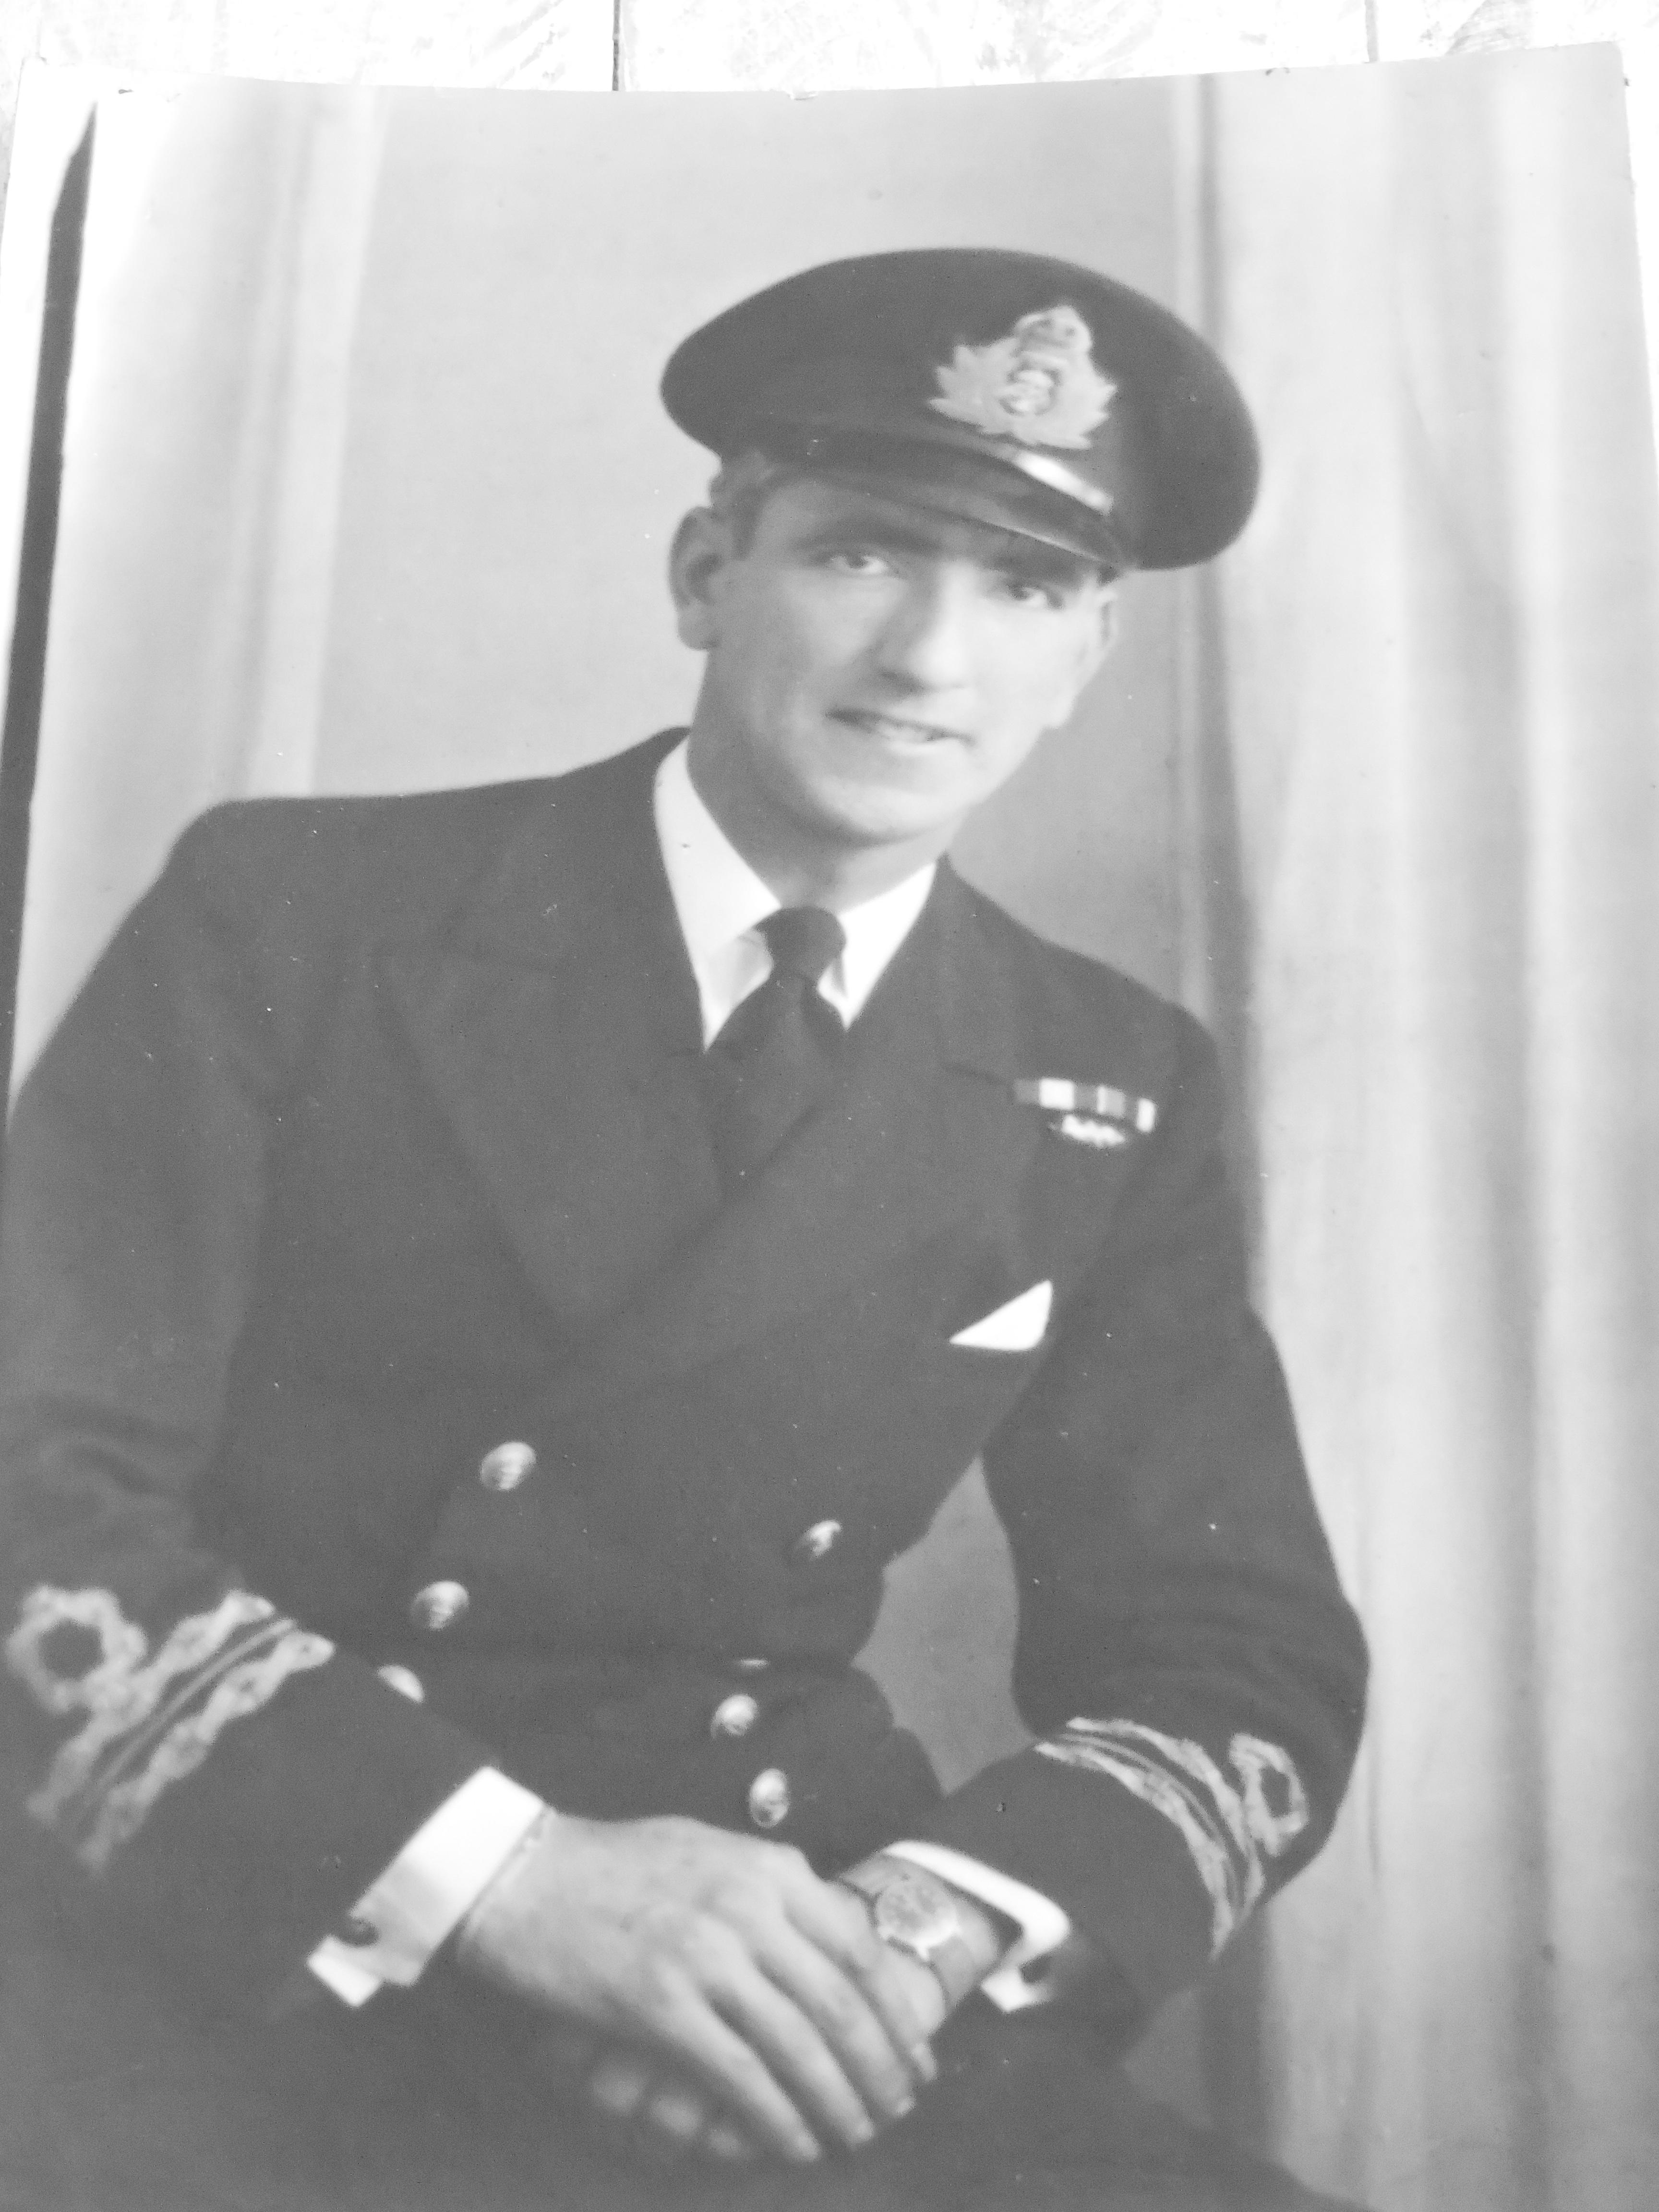 HMS Keats Captain N.F. Israel (T/A/Lt.Cdr. , DSC, RNR)